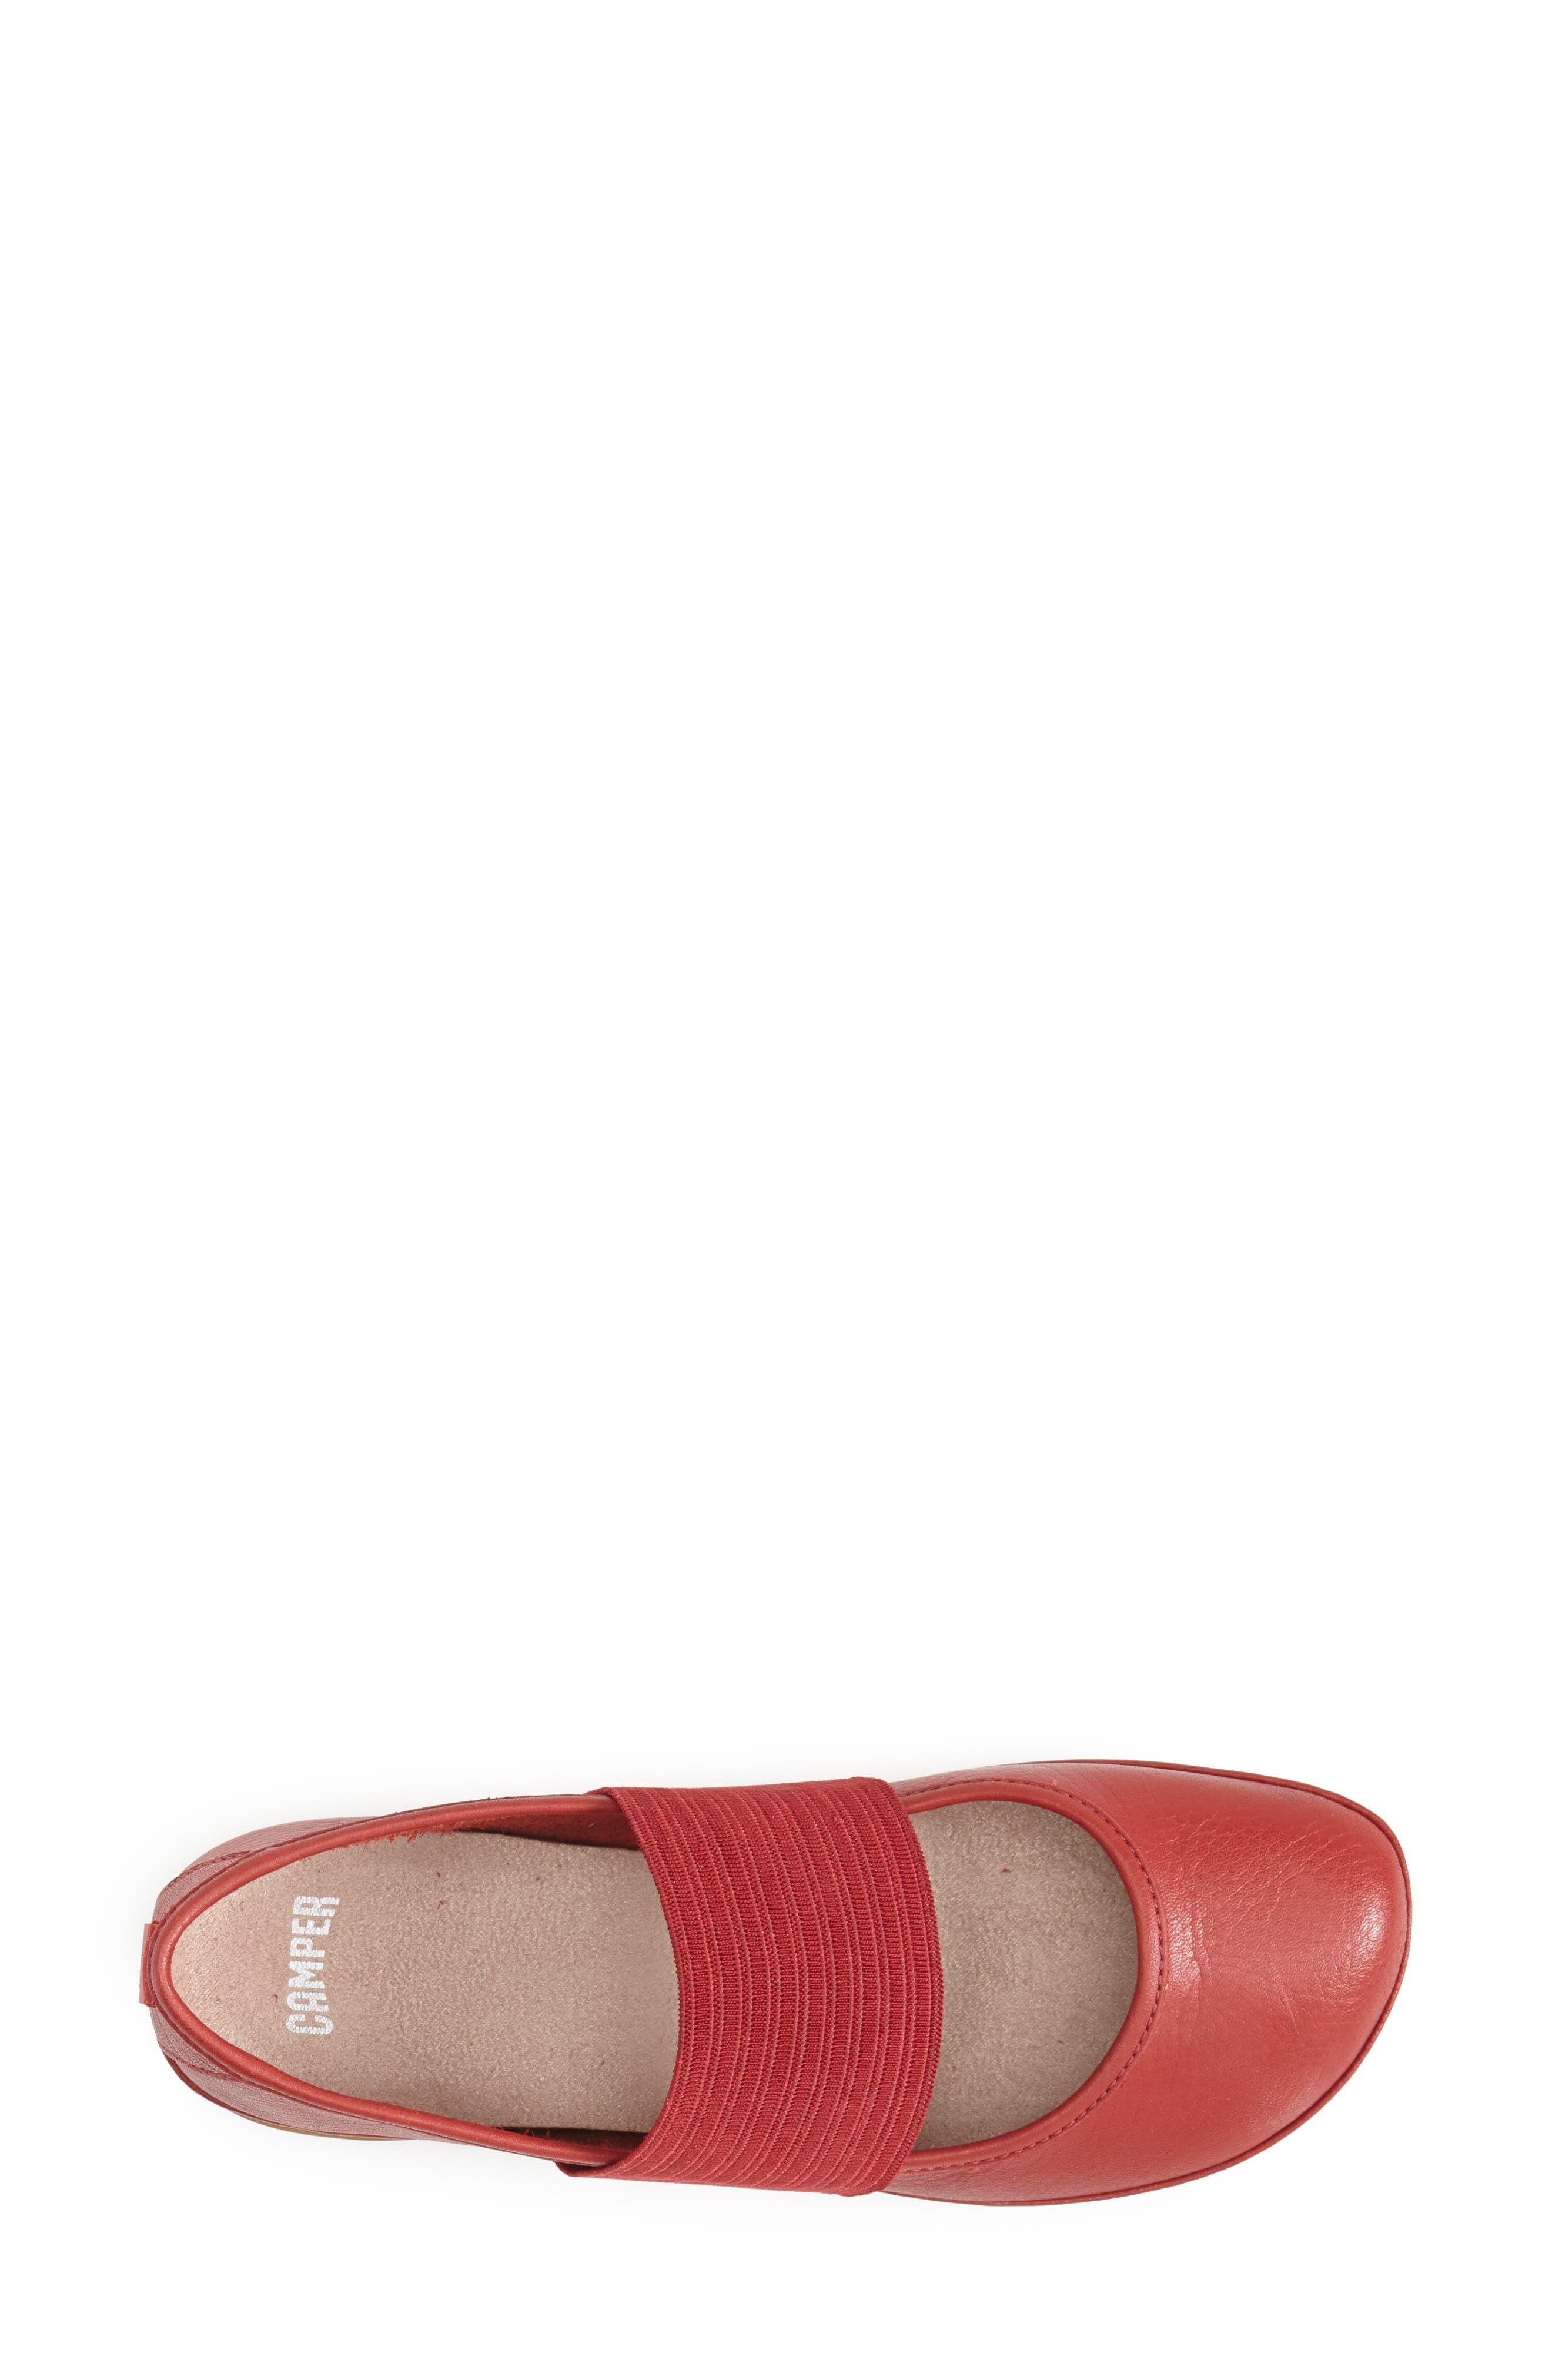 'Right Nina' Leather Ballerina Flat,                             Alternate thumbnail 71, color,